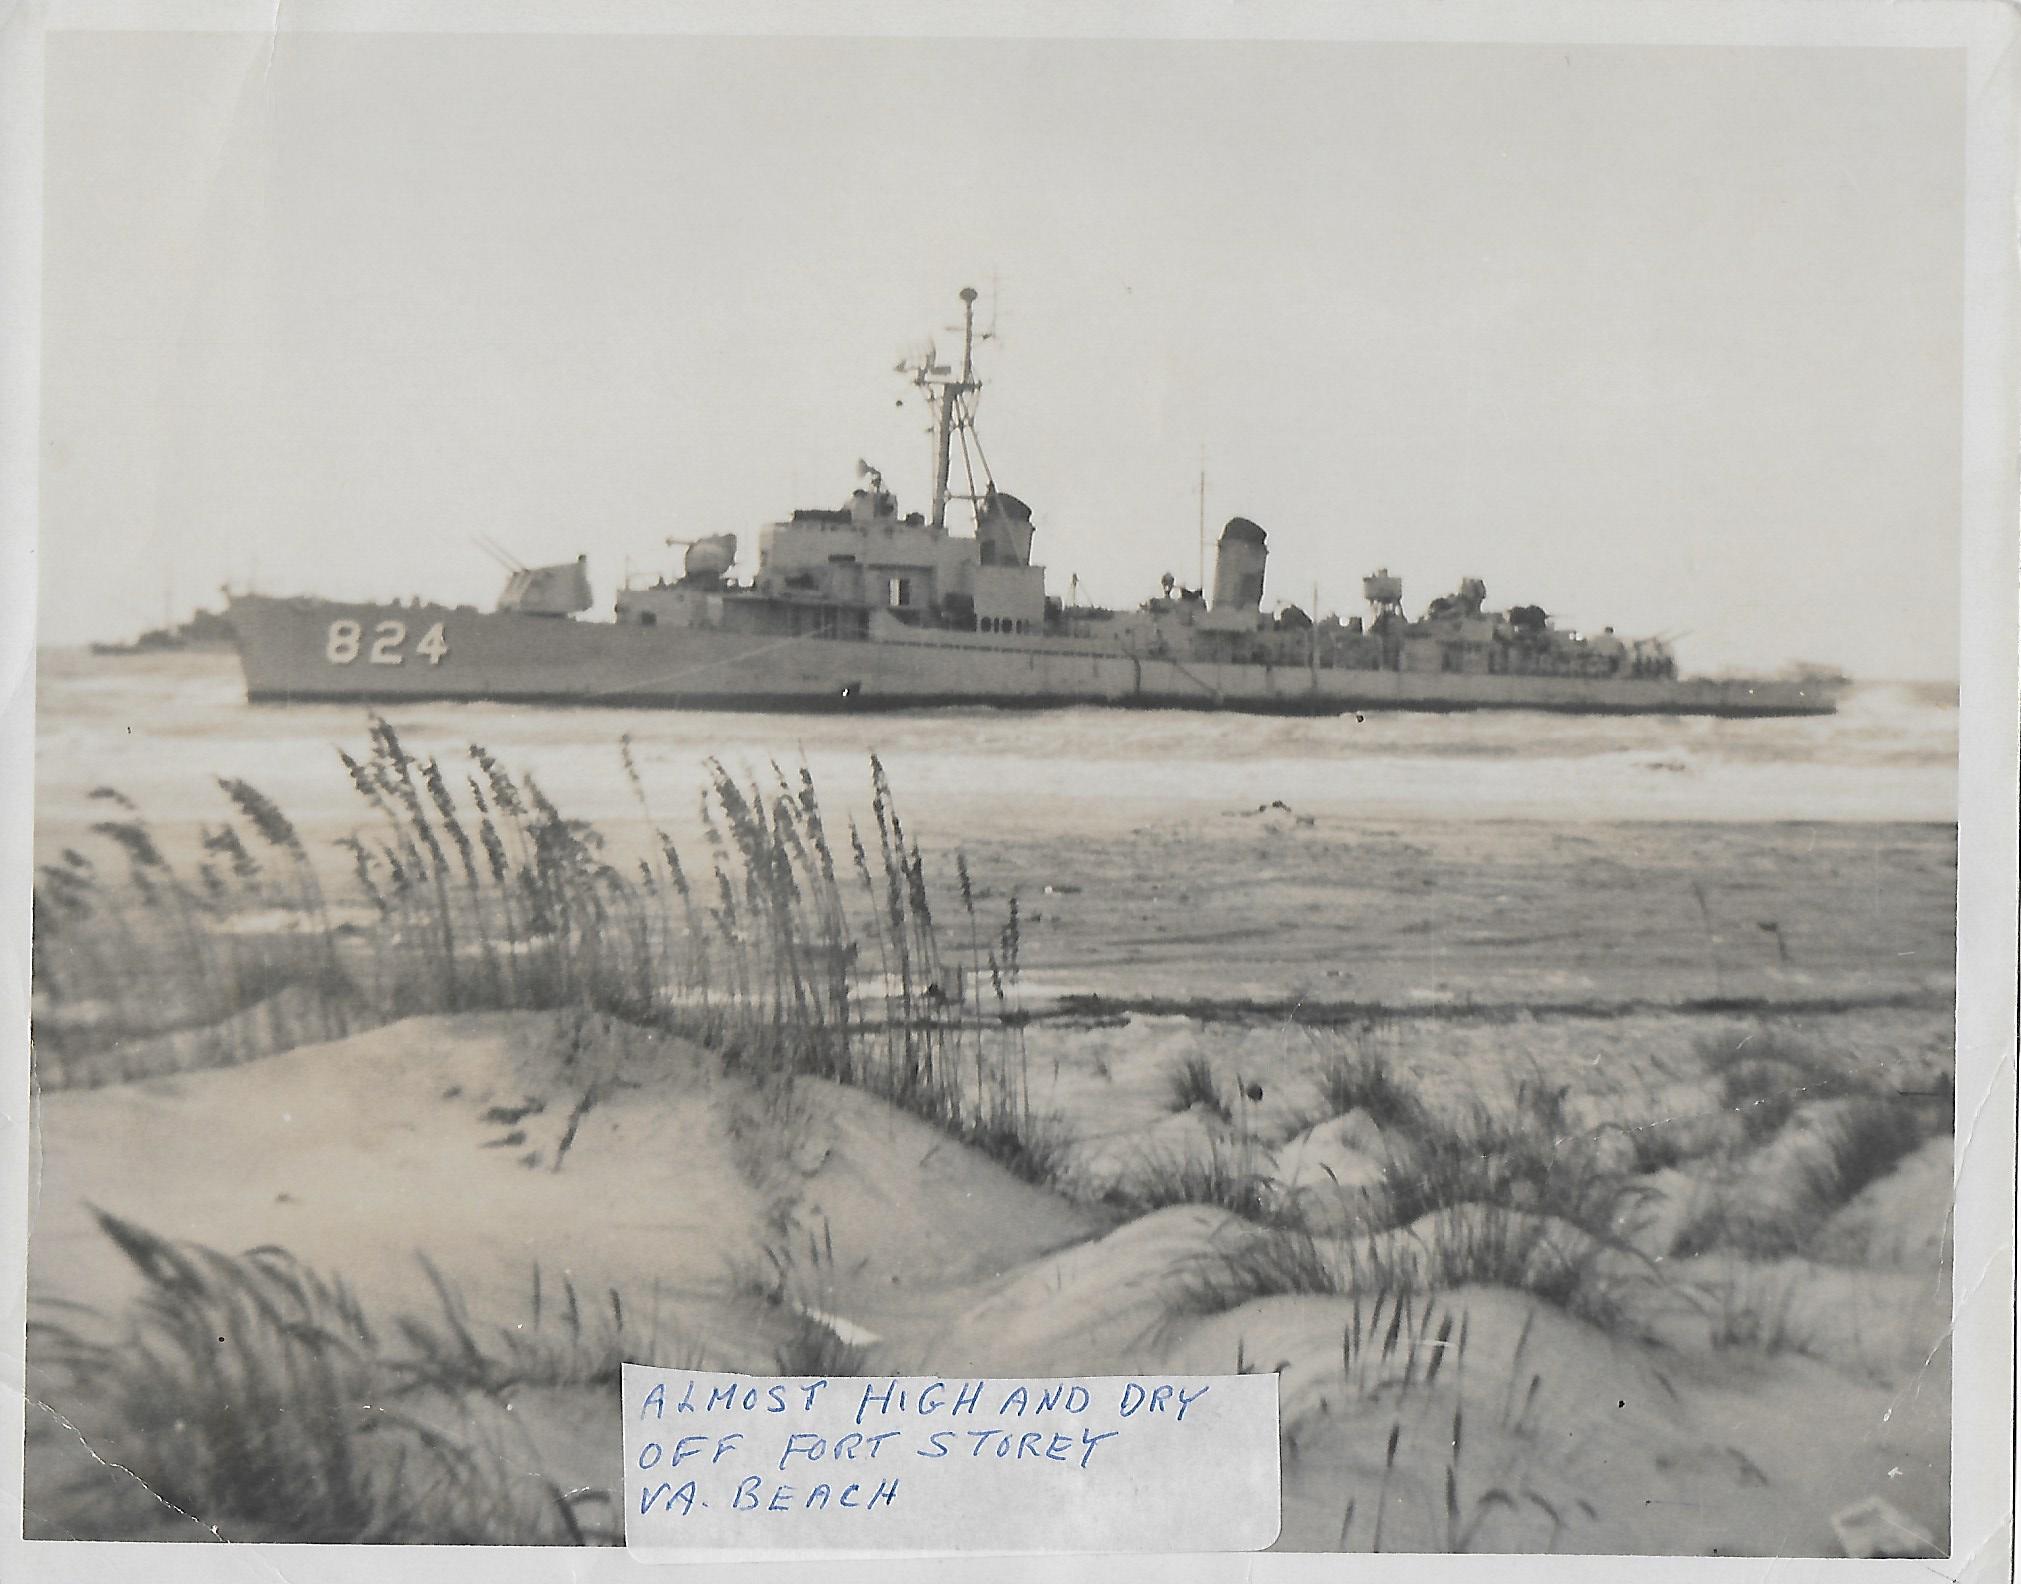 USS Basilone Grounded at Fort Story, VA